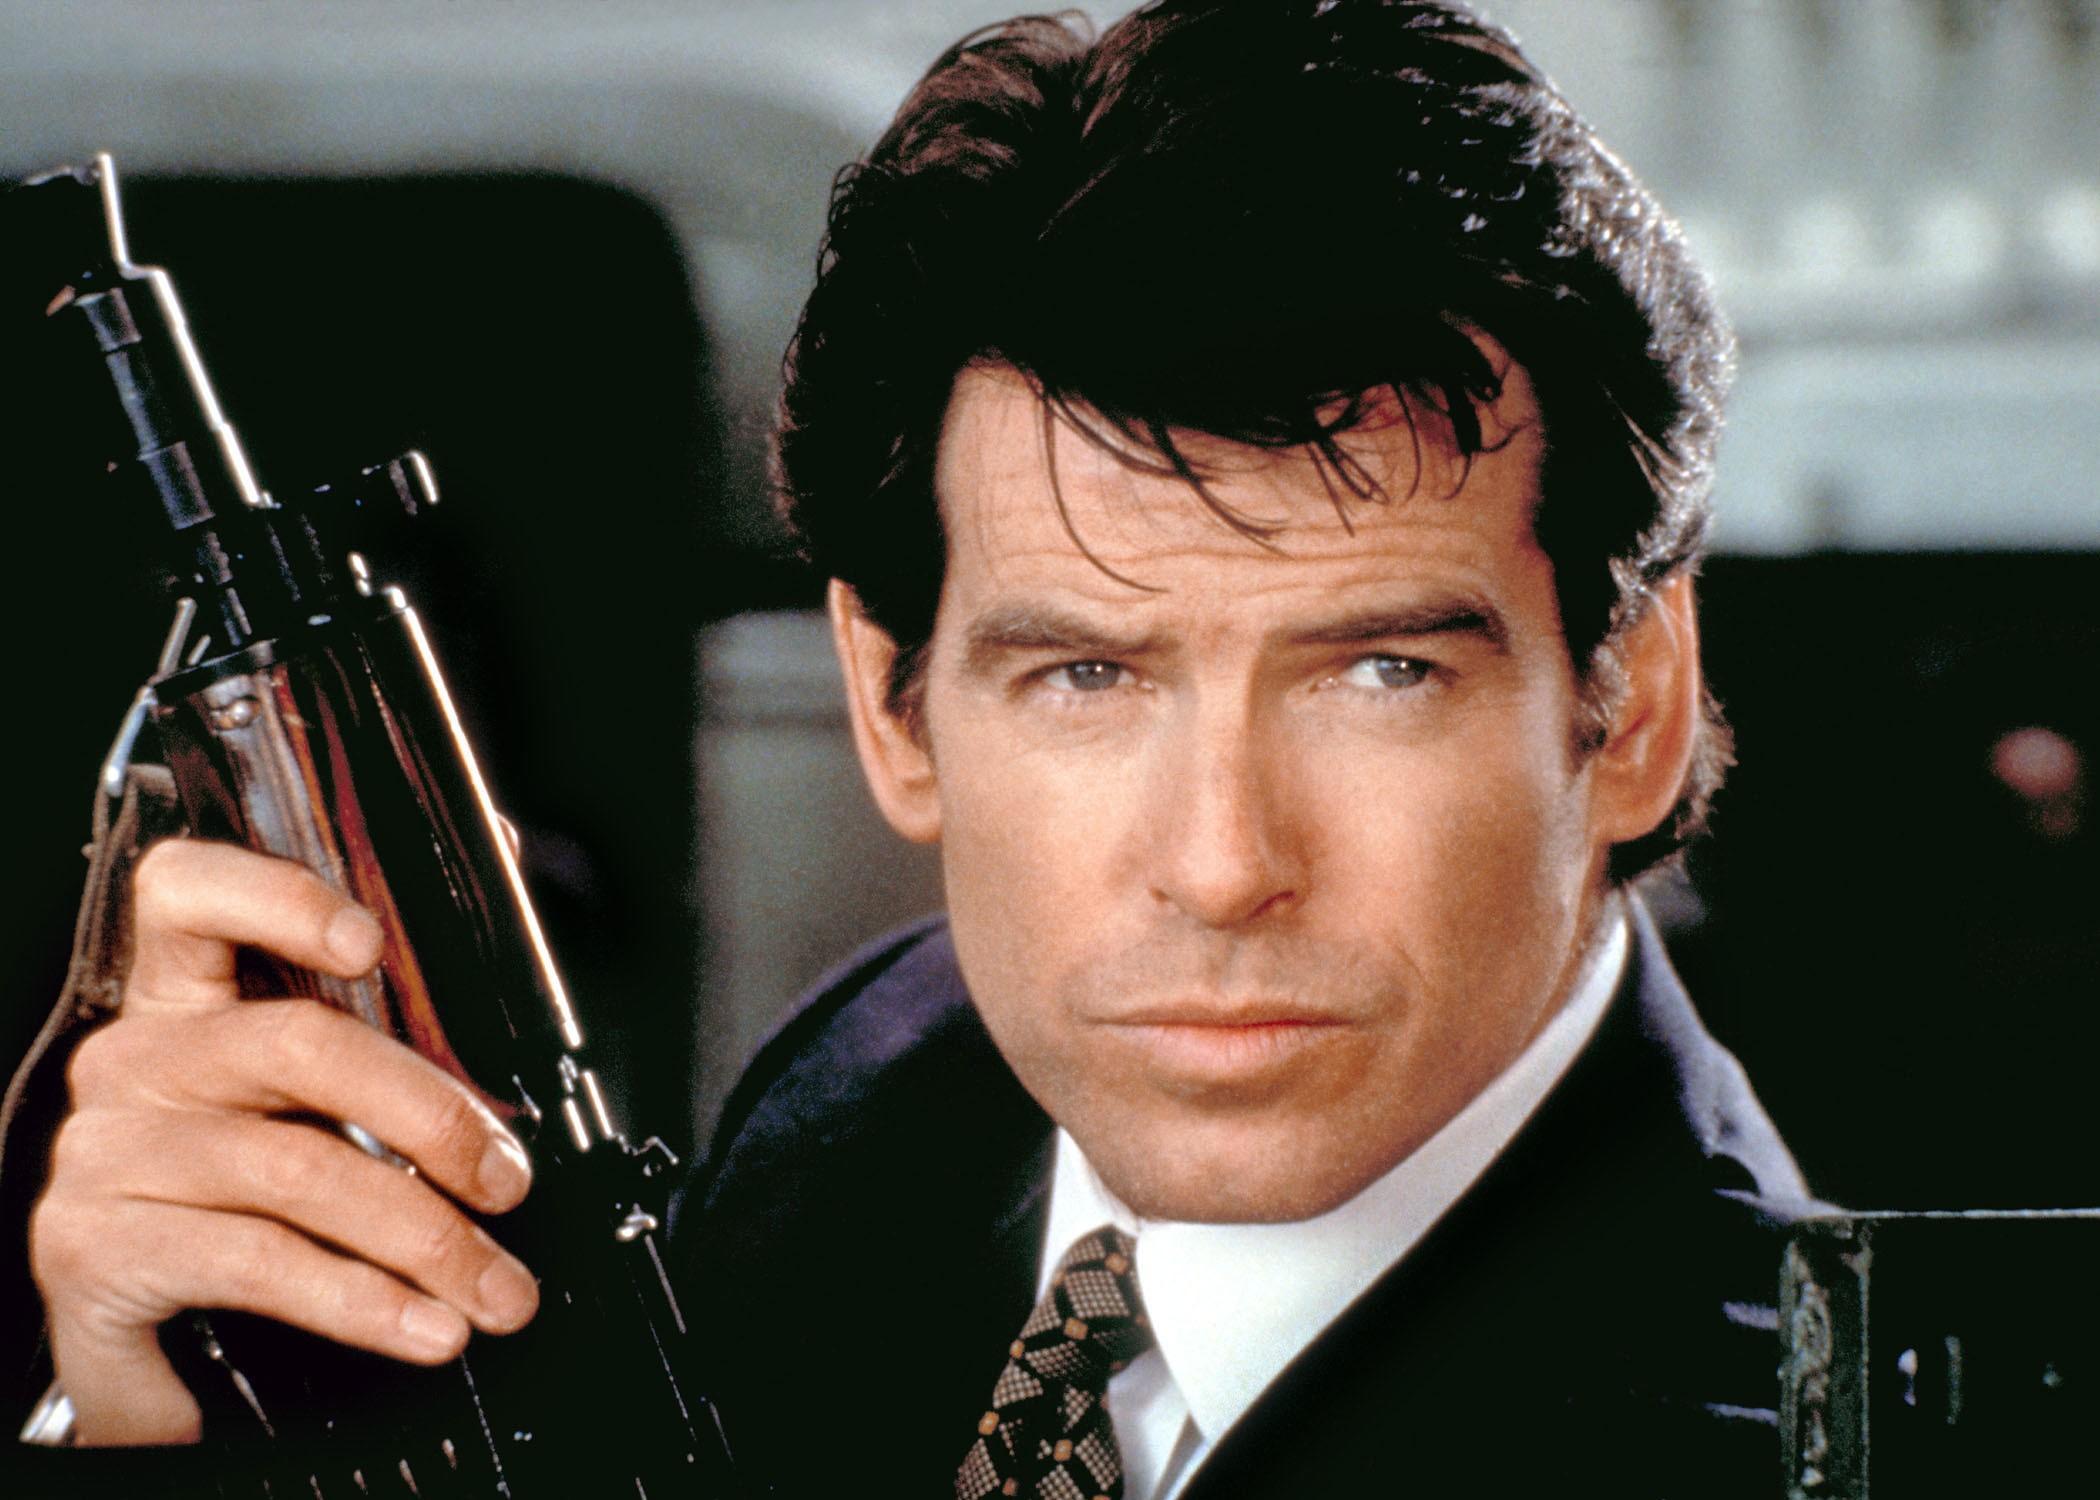 James Bond Movies - GoldenEye (1995)